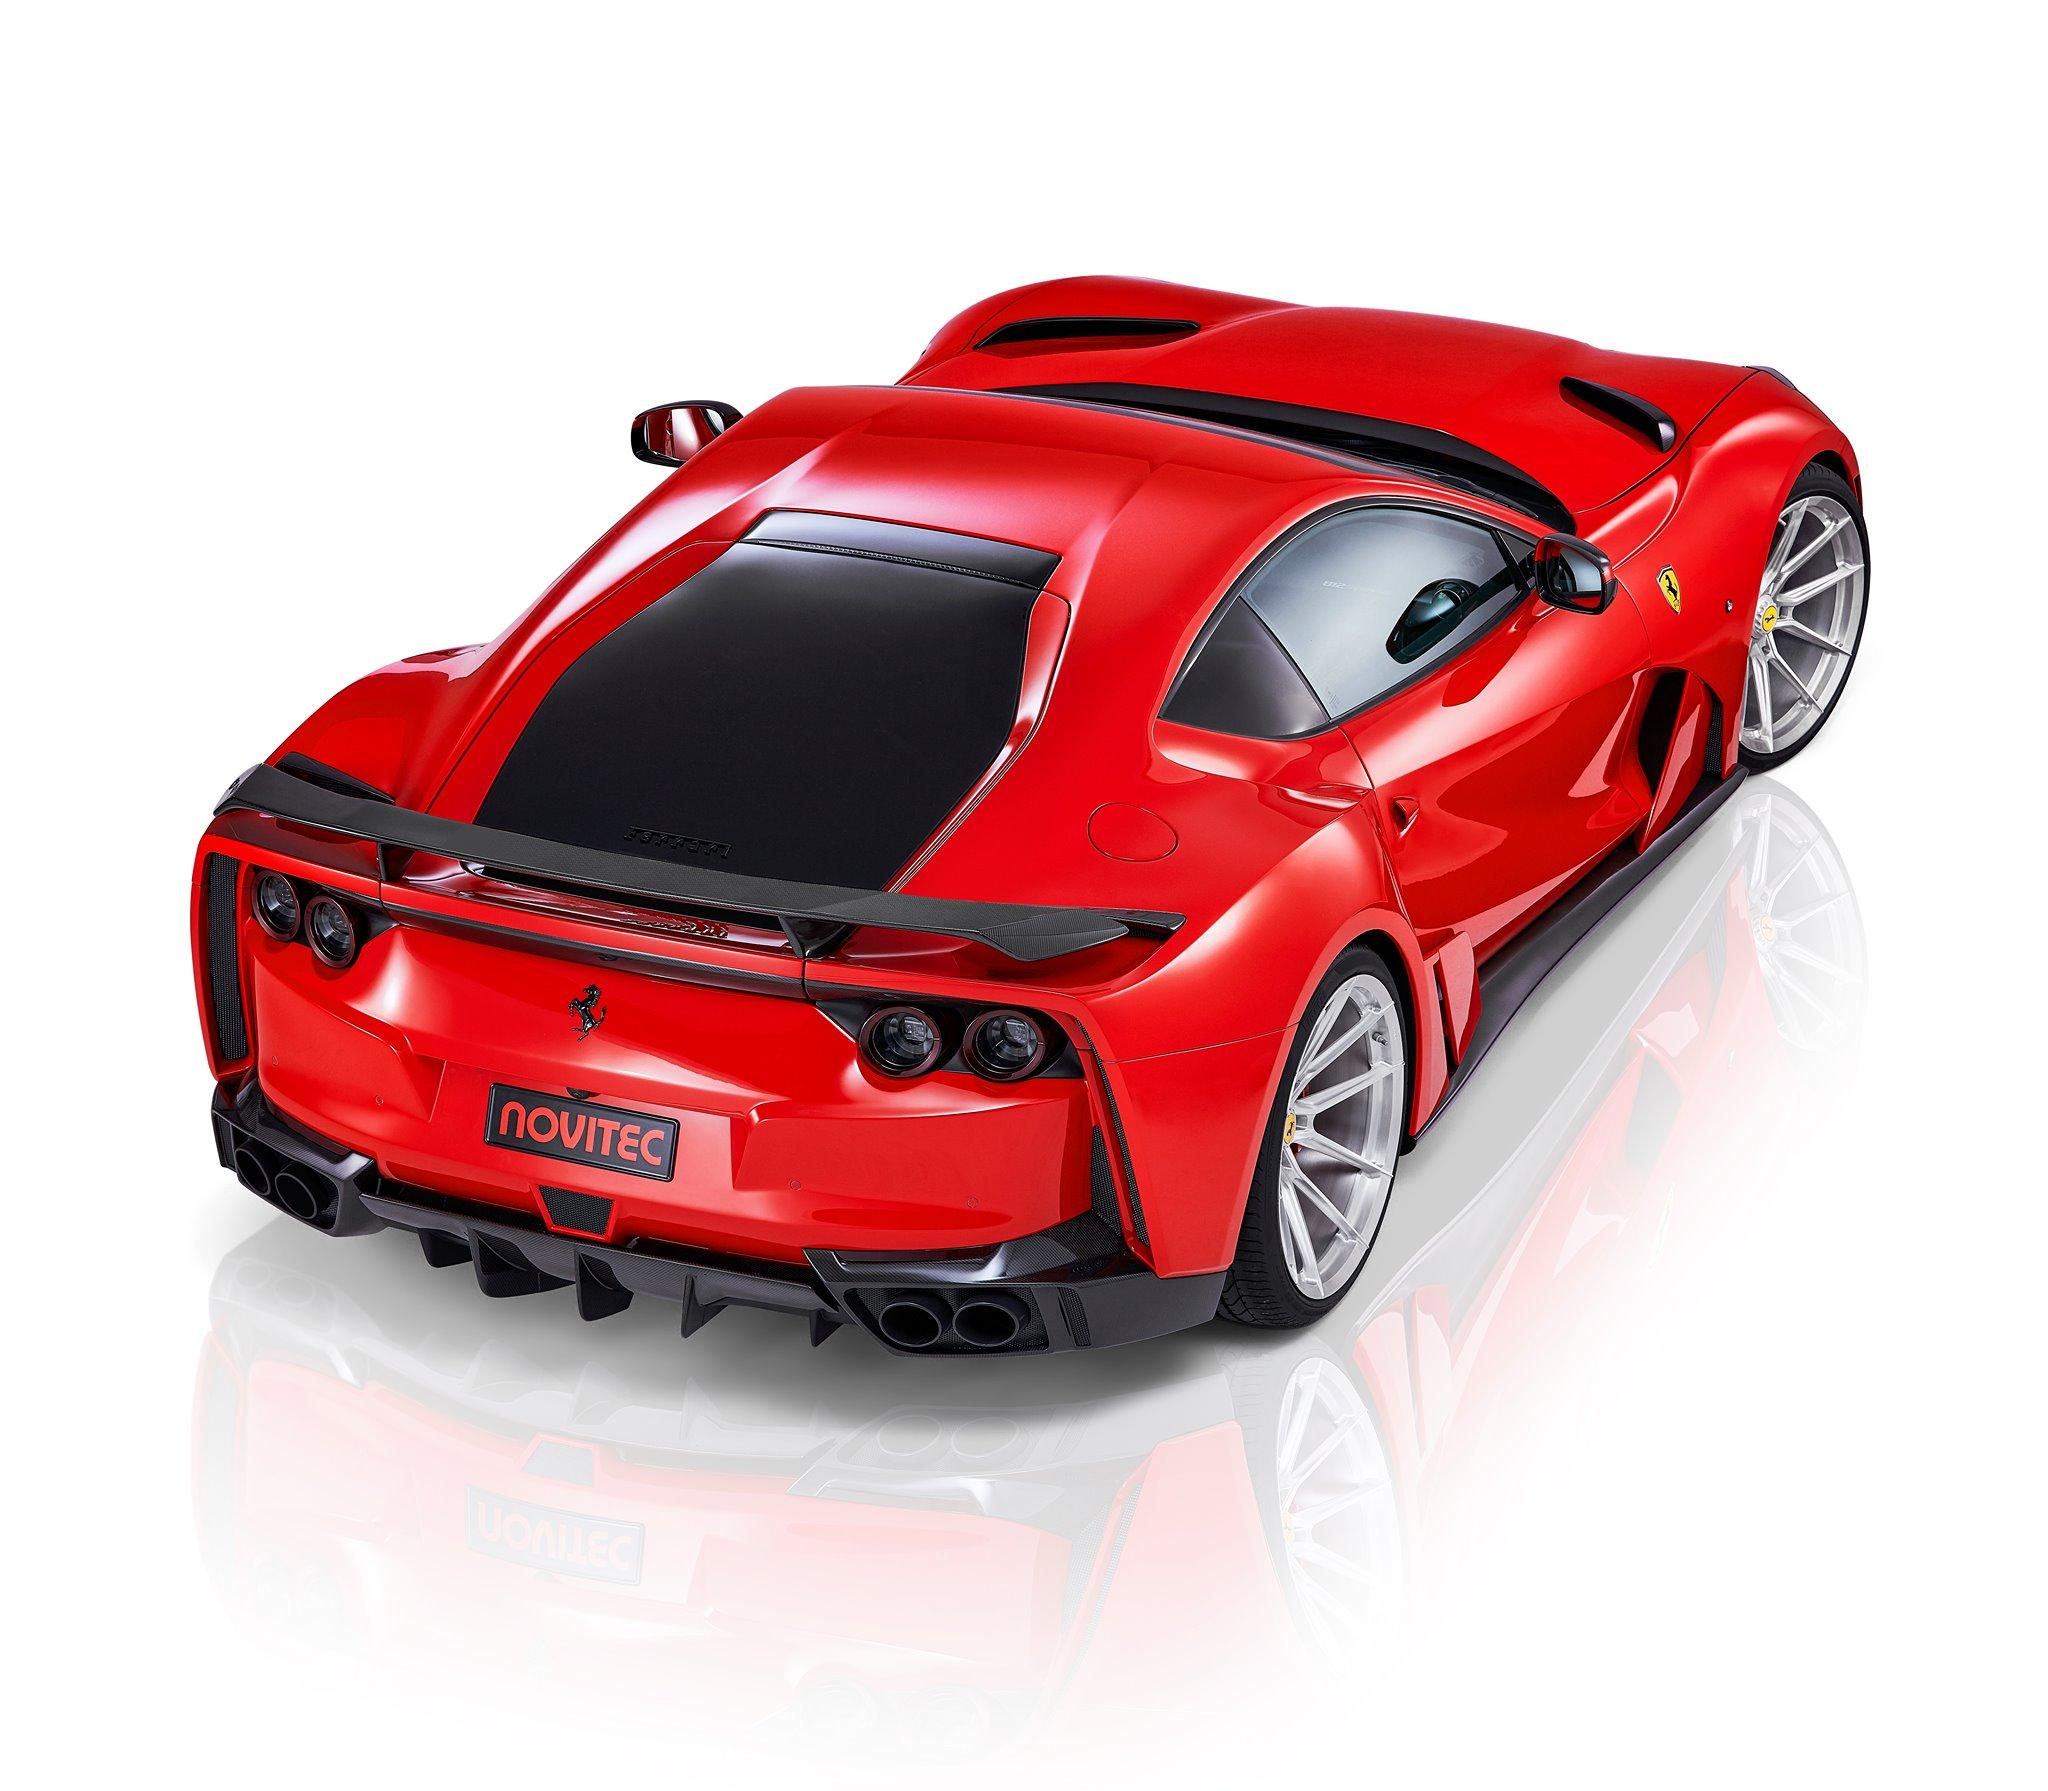 Ferrari-812-Superfast-N-Largo-by-Novitec-27